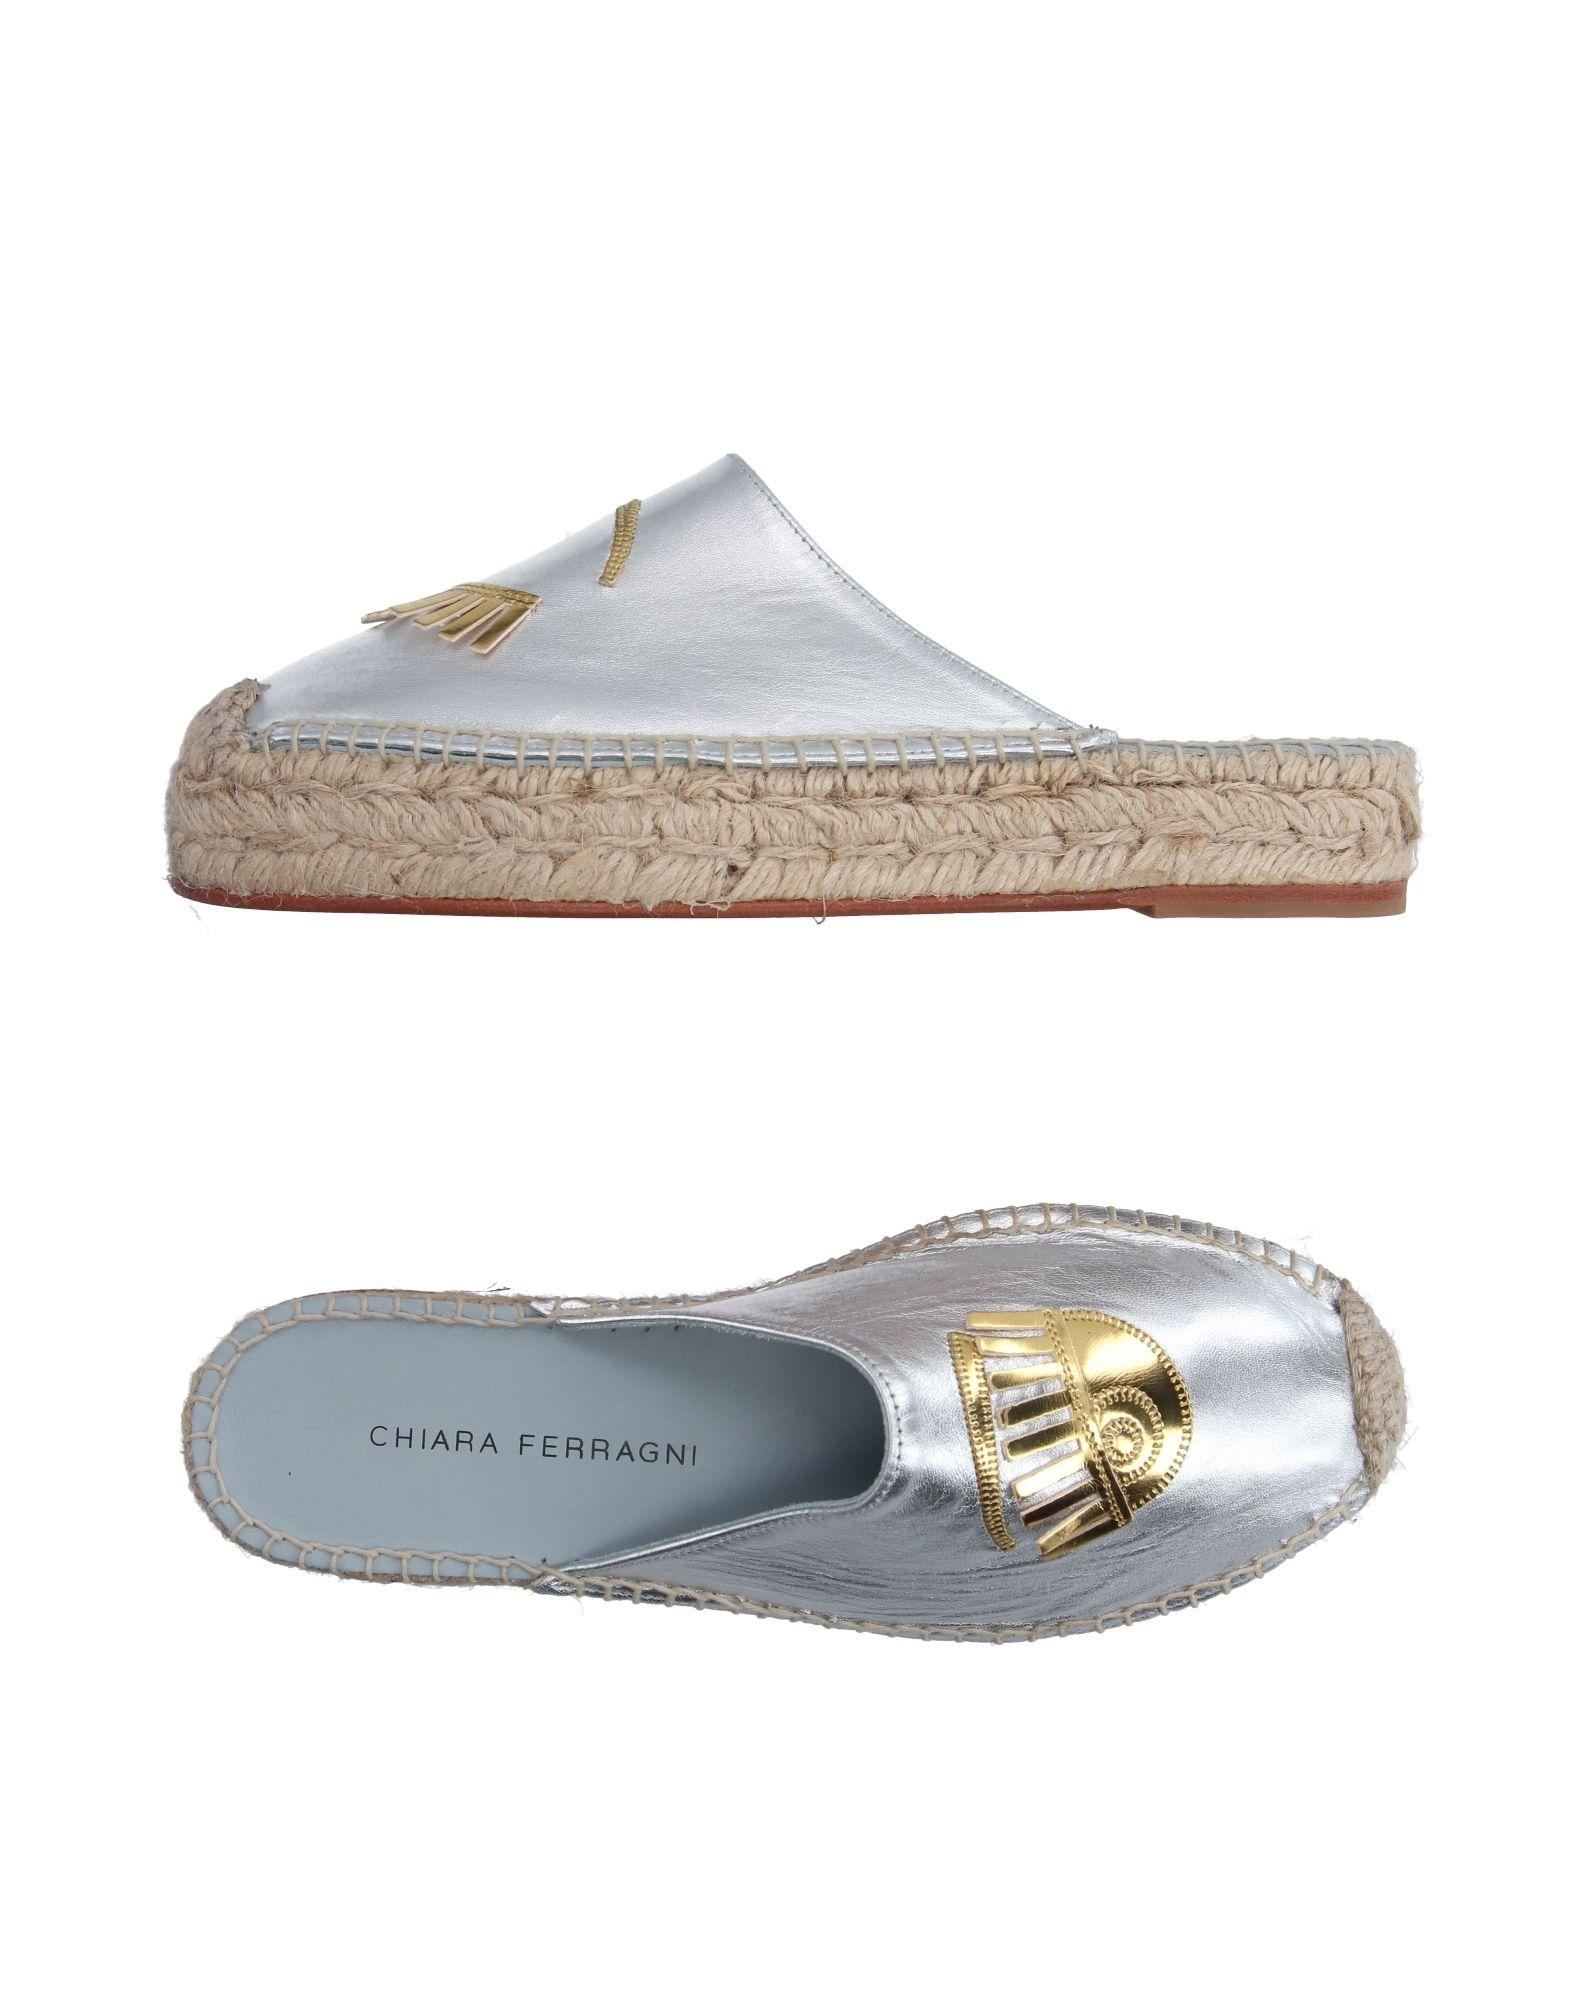 Chiara Ferragni Espadrilles Damen  11183806HN Gute Qualität beliebte Schuhe